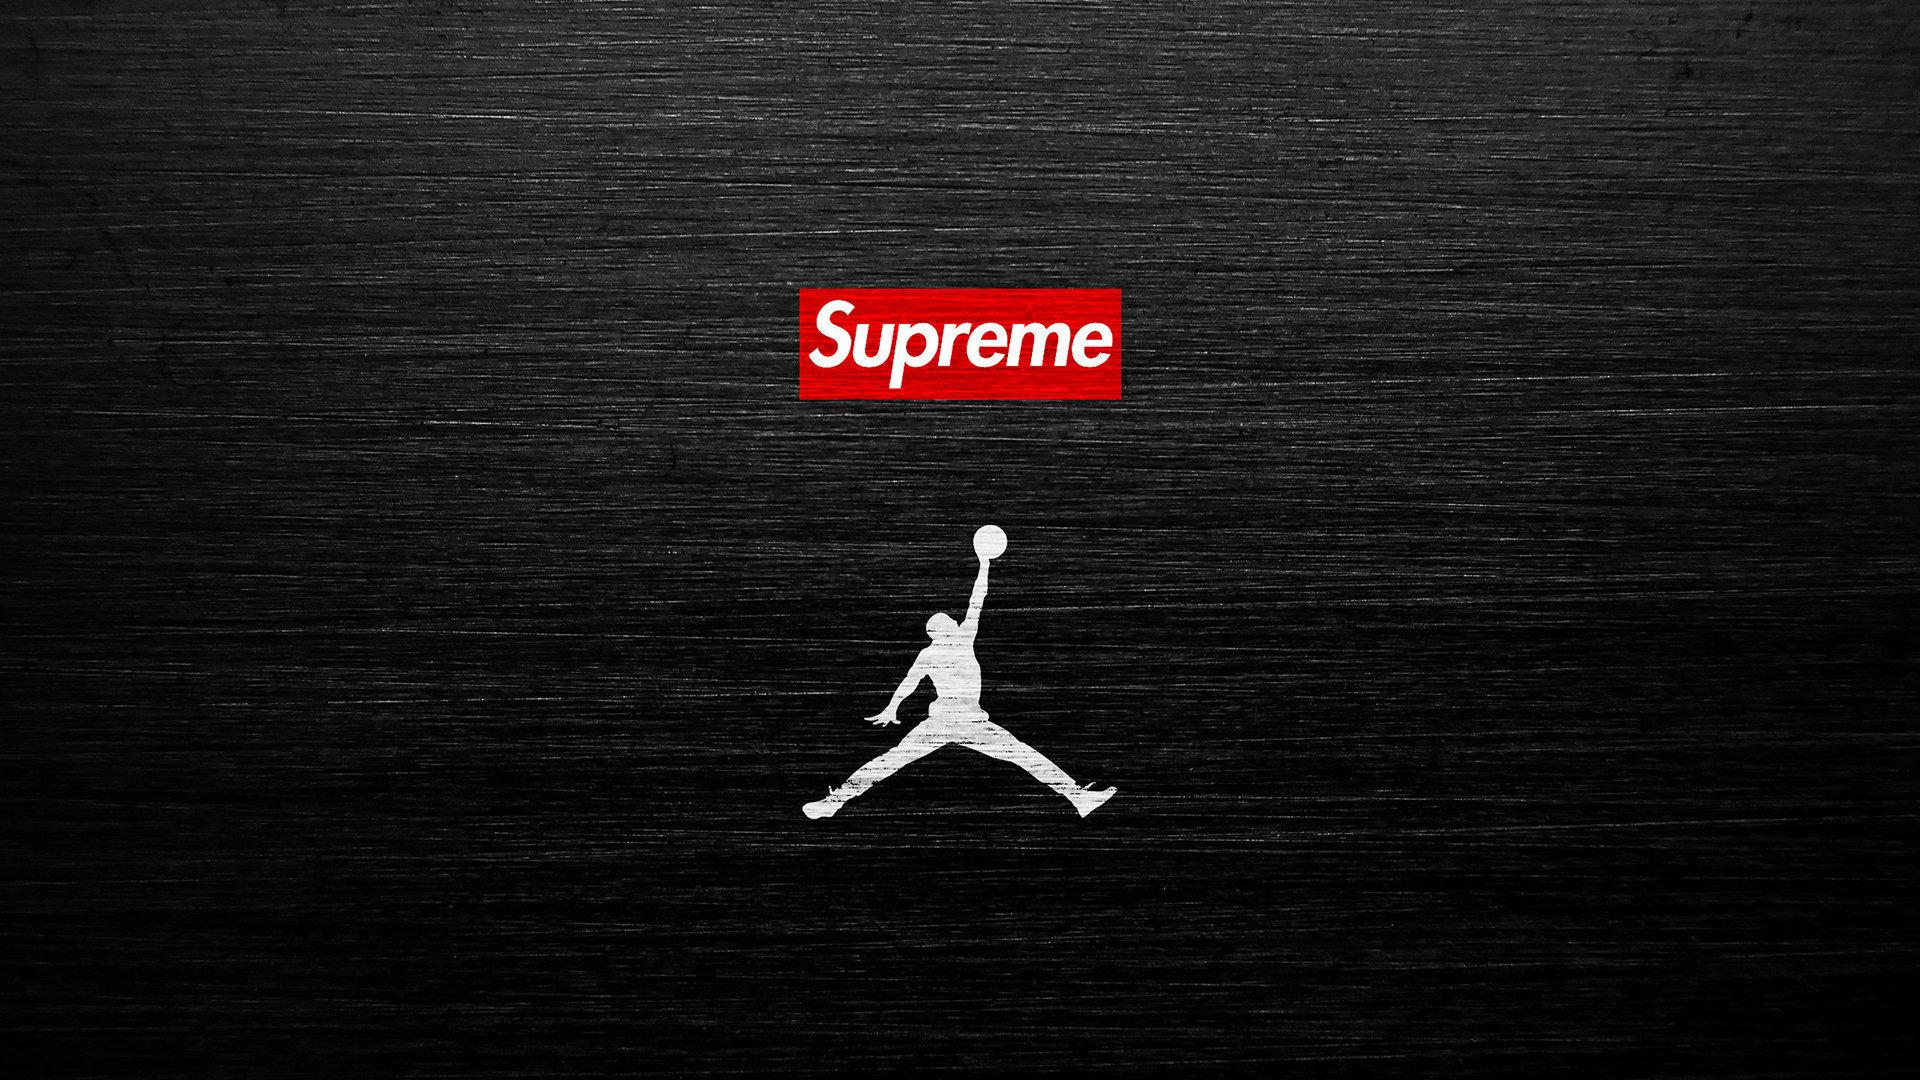 Air Jordan Supreme Wallpaper   AuthenticSupremecom 1920x1080